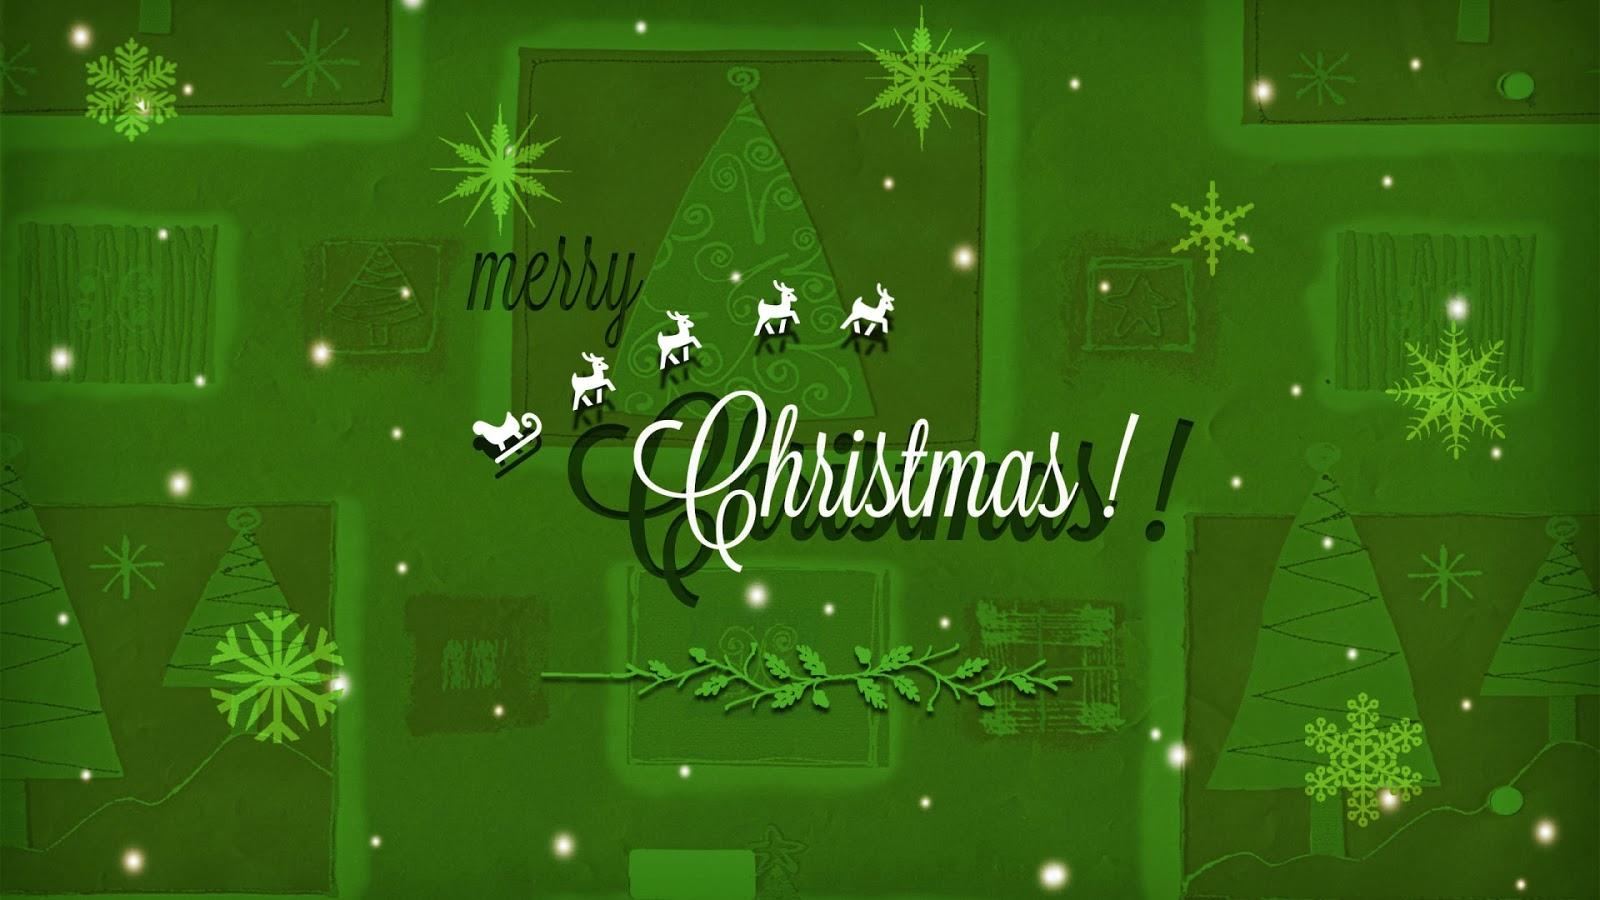 Sony Ericsson Cell Phone Mobiles Green Christmas Cellphone Wallpaper